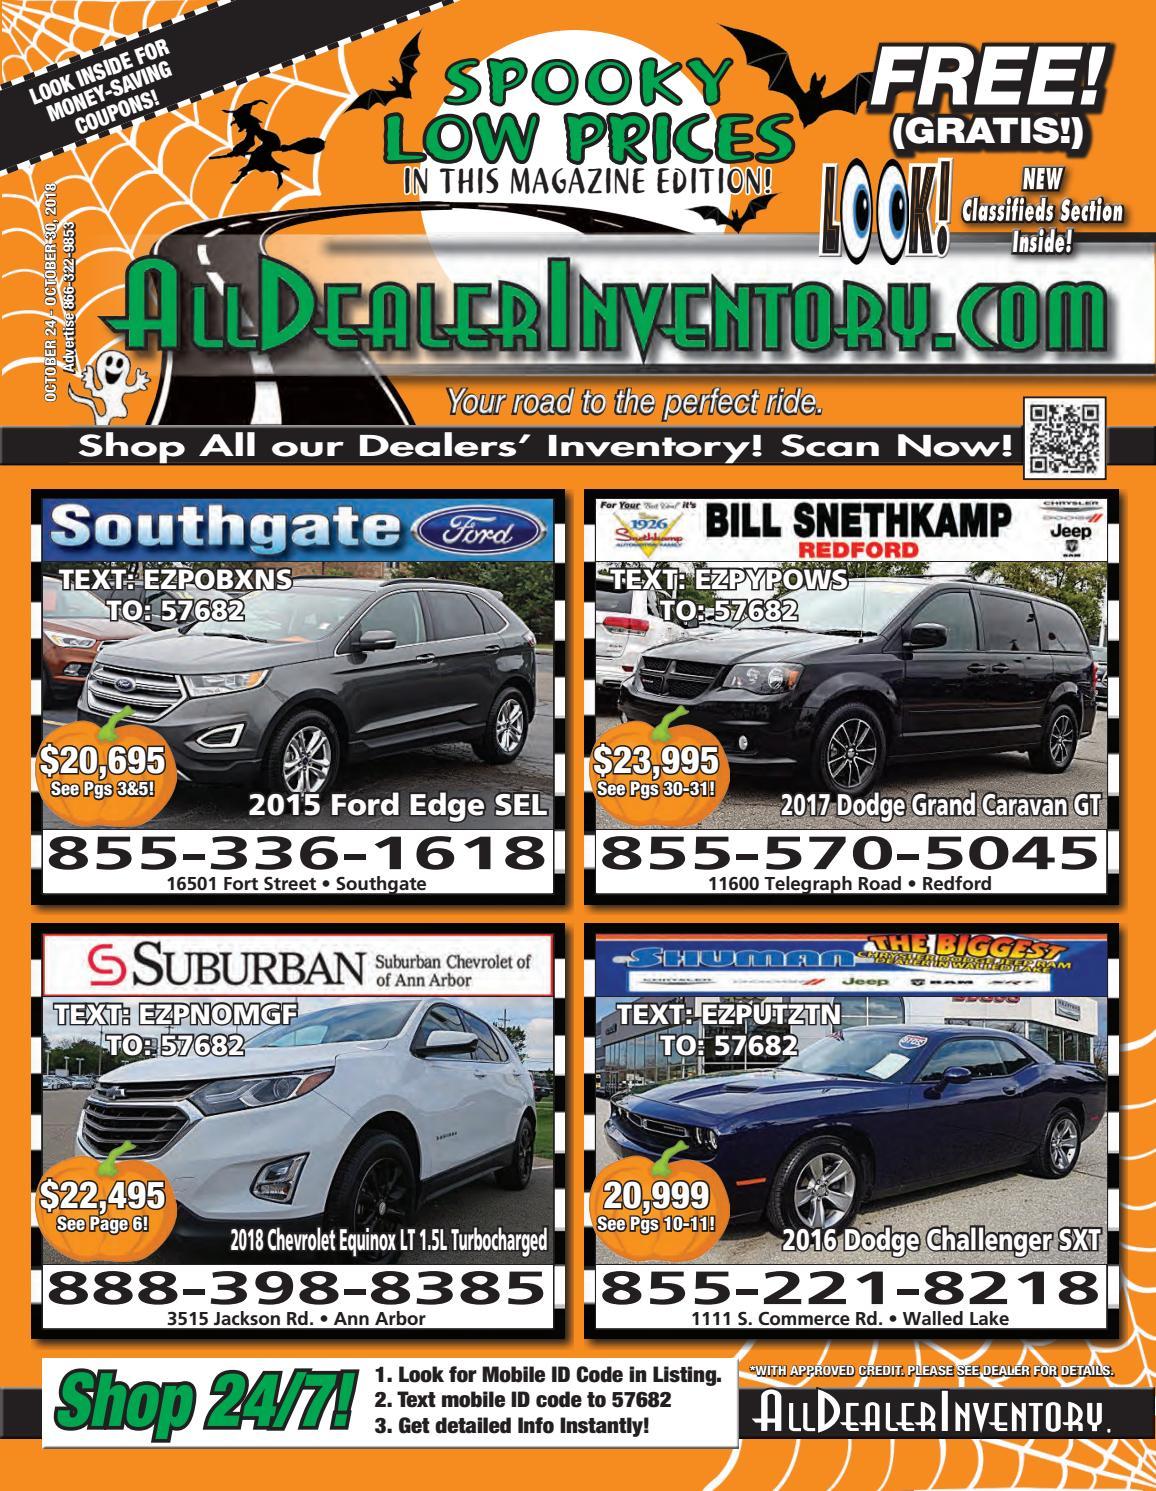 All Dealer Inventory's October 24th Digital Edition! Shop